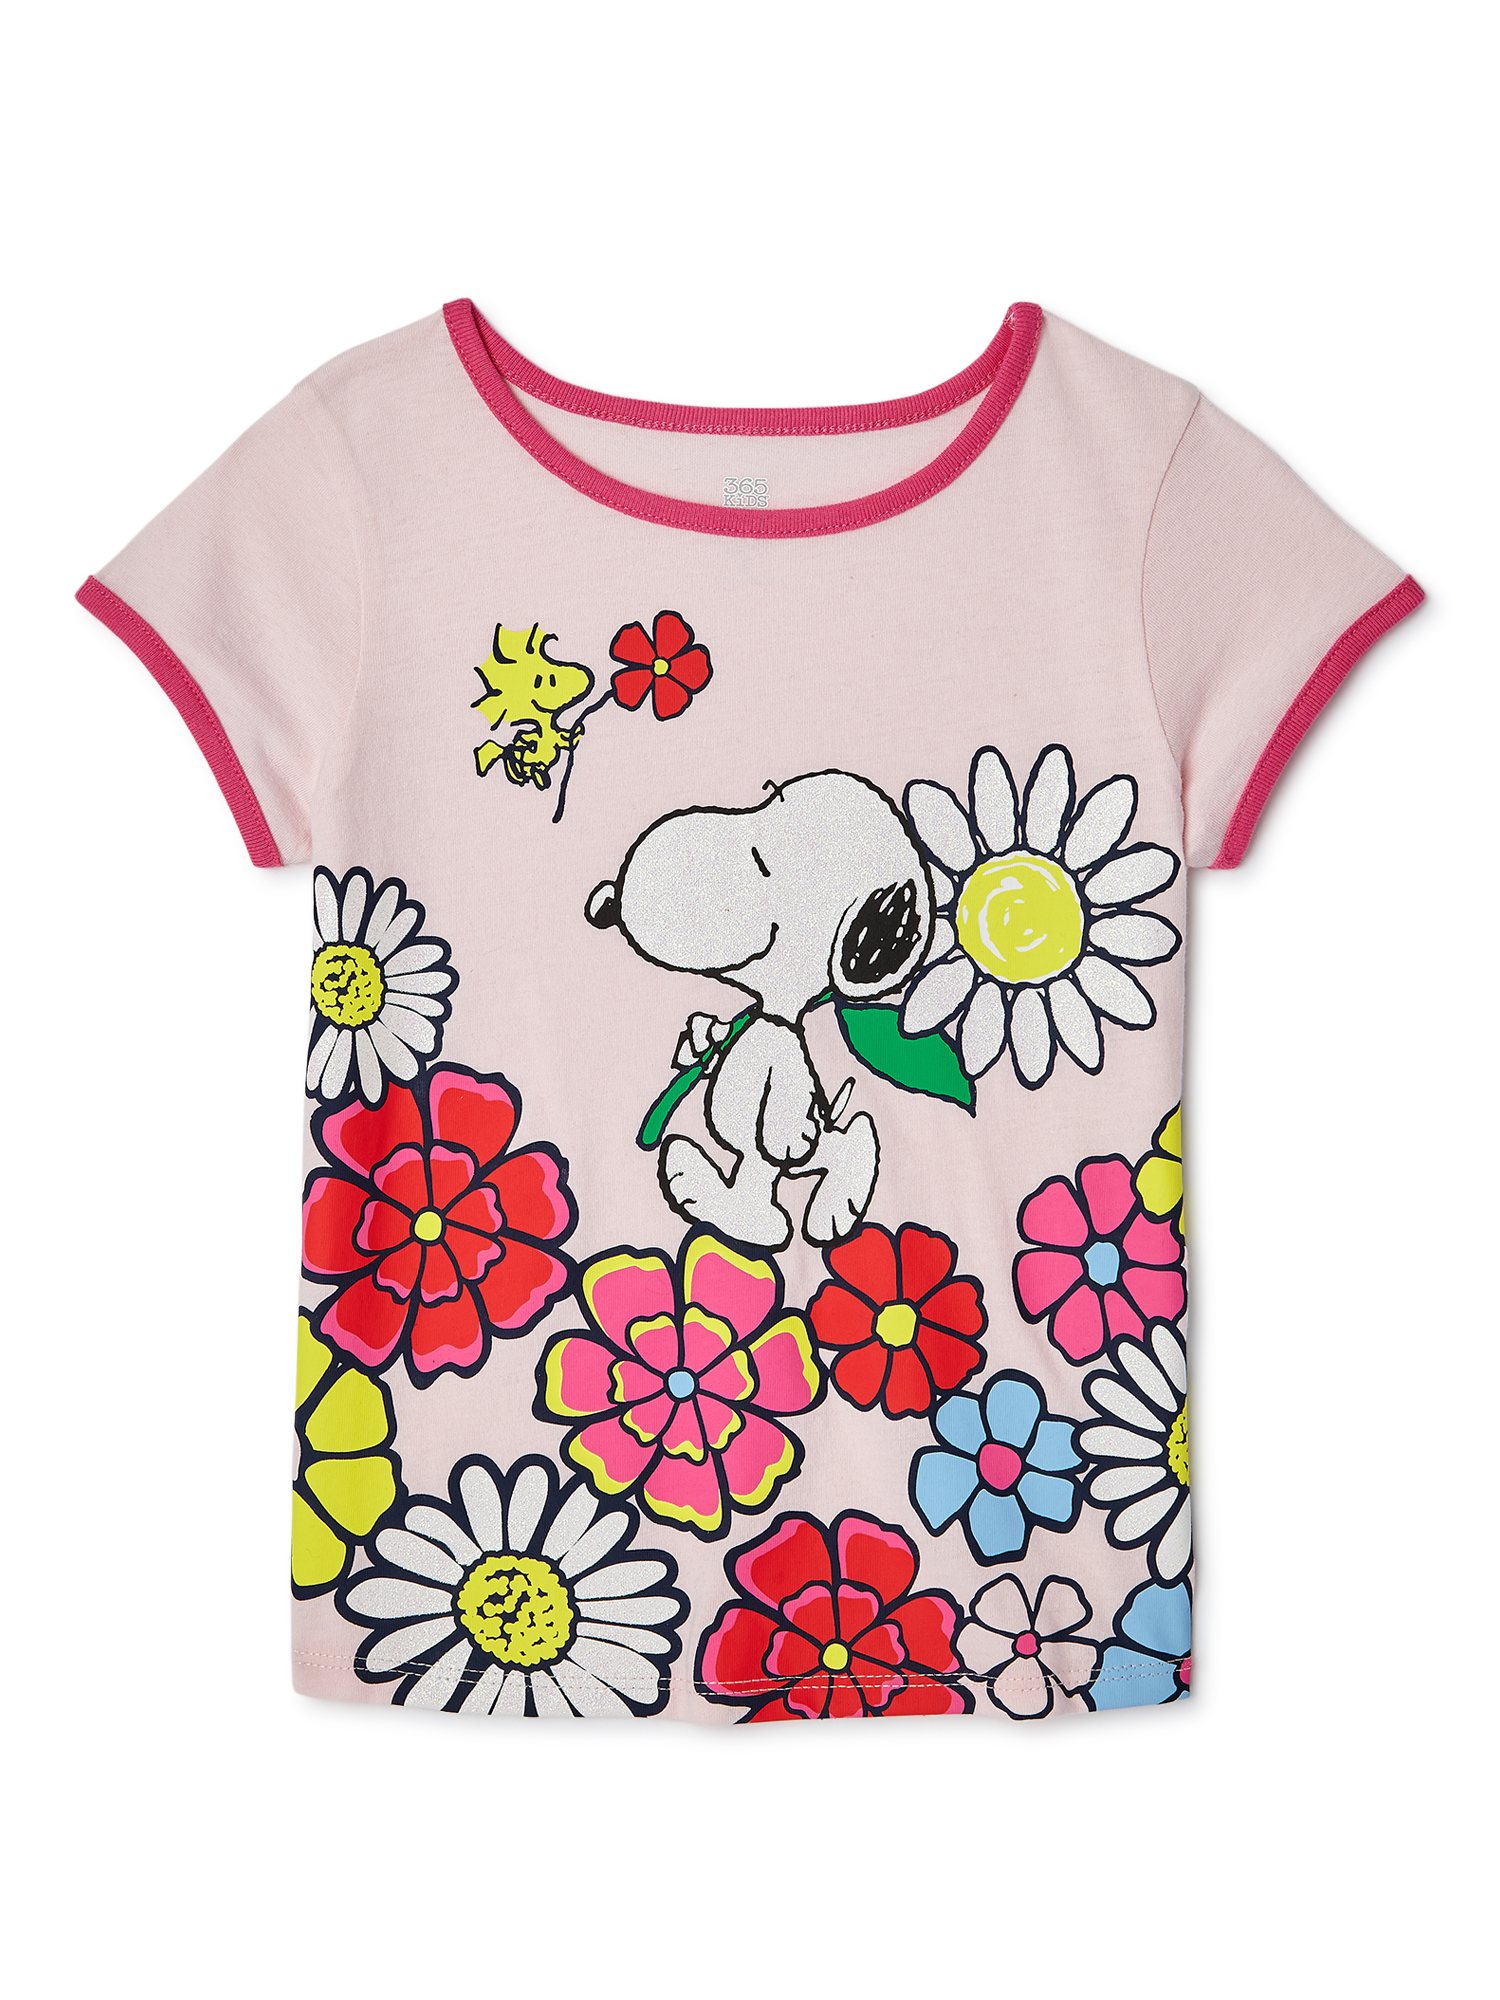 365 Kids From Garanimals Little Girls Peanuts Short Sleeve T-Shirt, Sizes 4-10